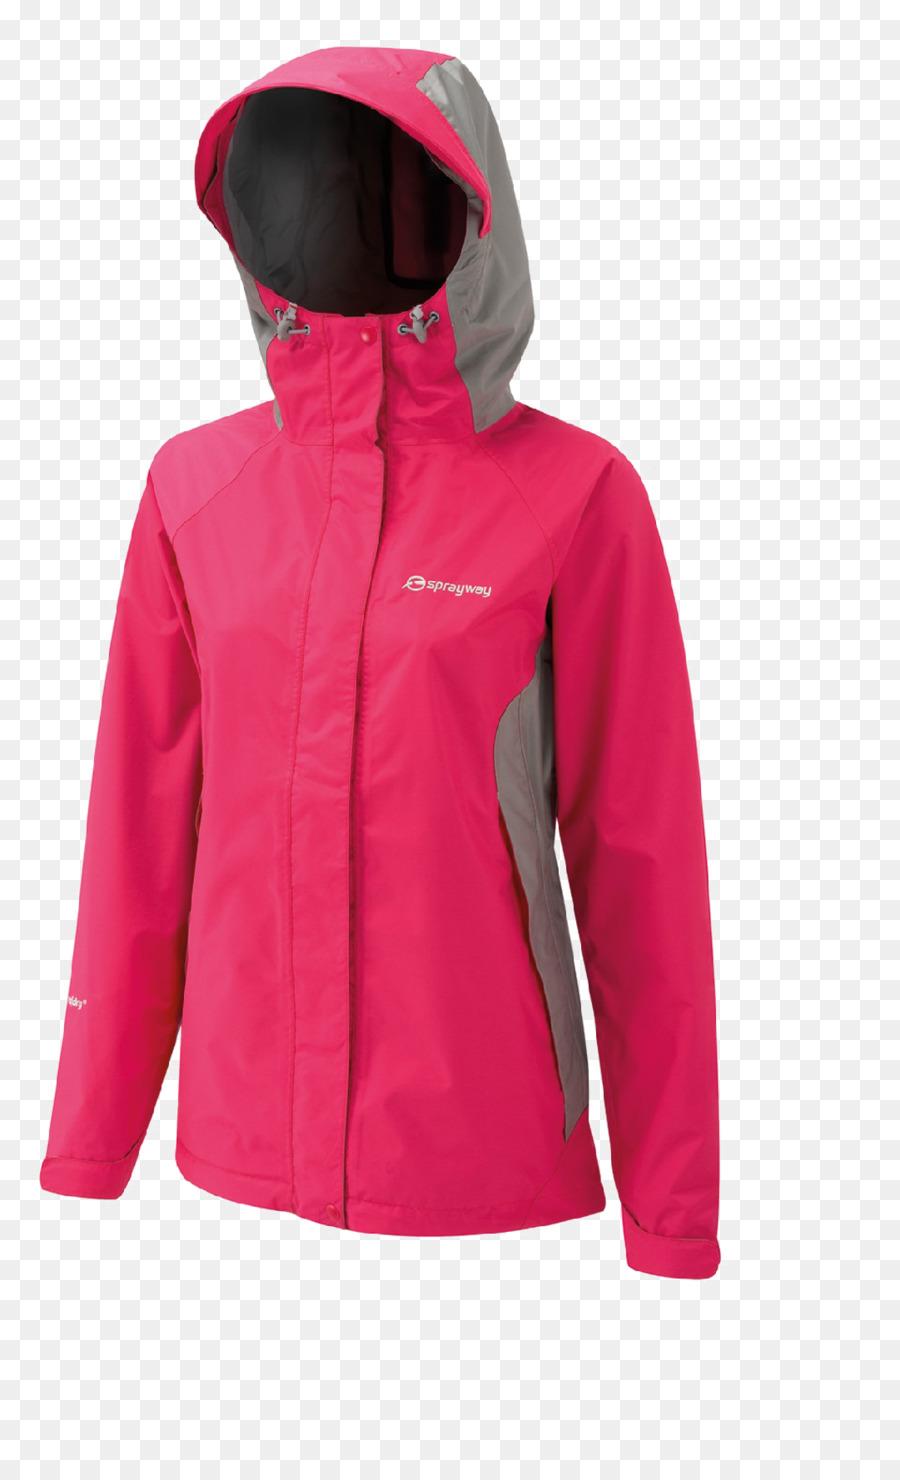 Jacket Waterproofing Raincoat Clothing Winter Coat